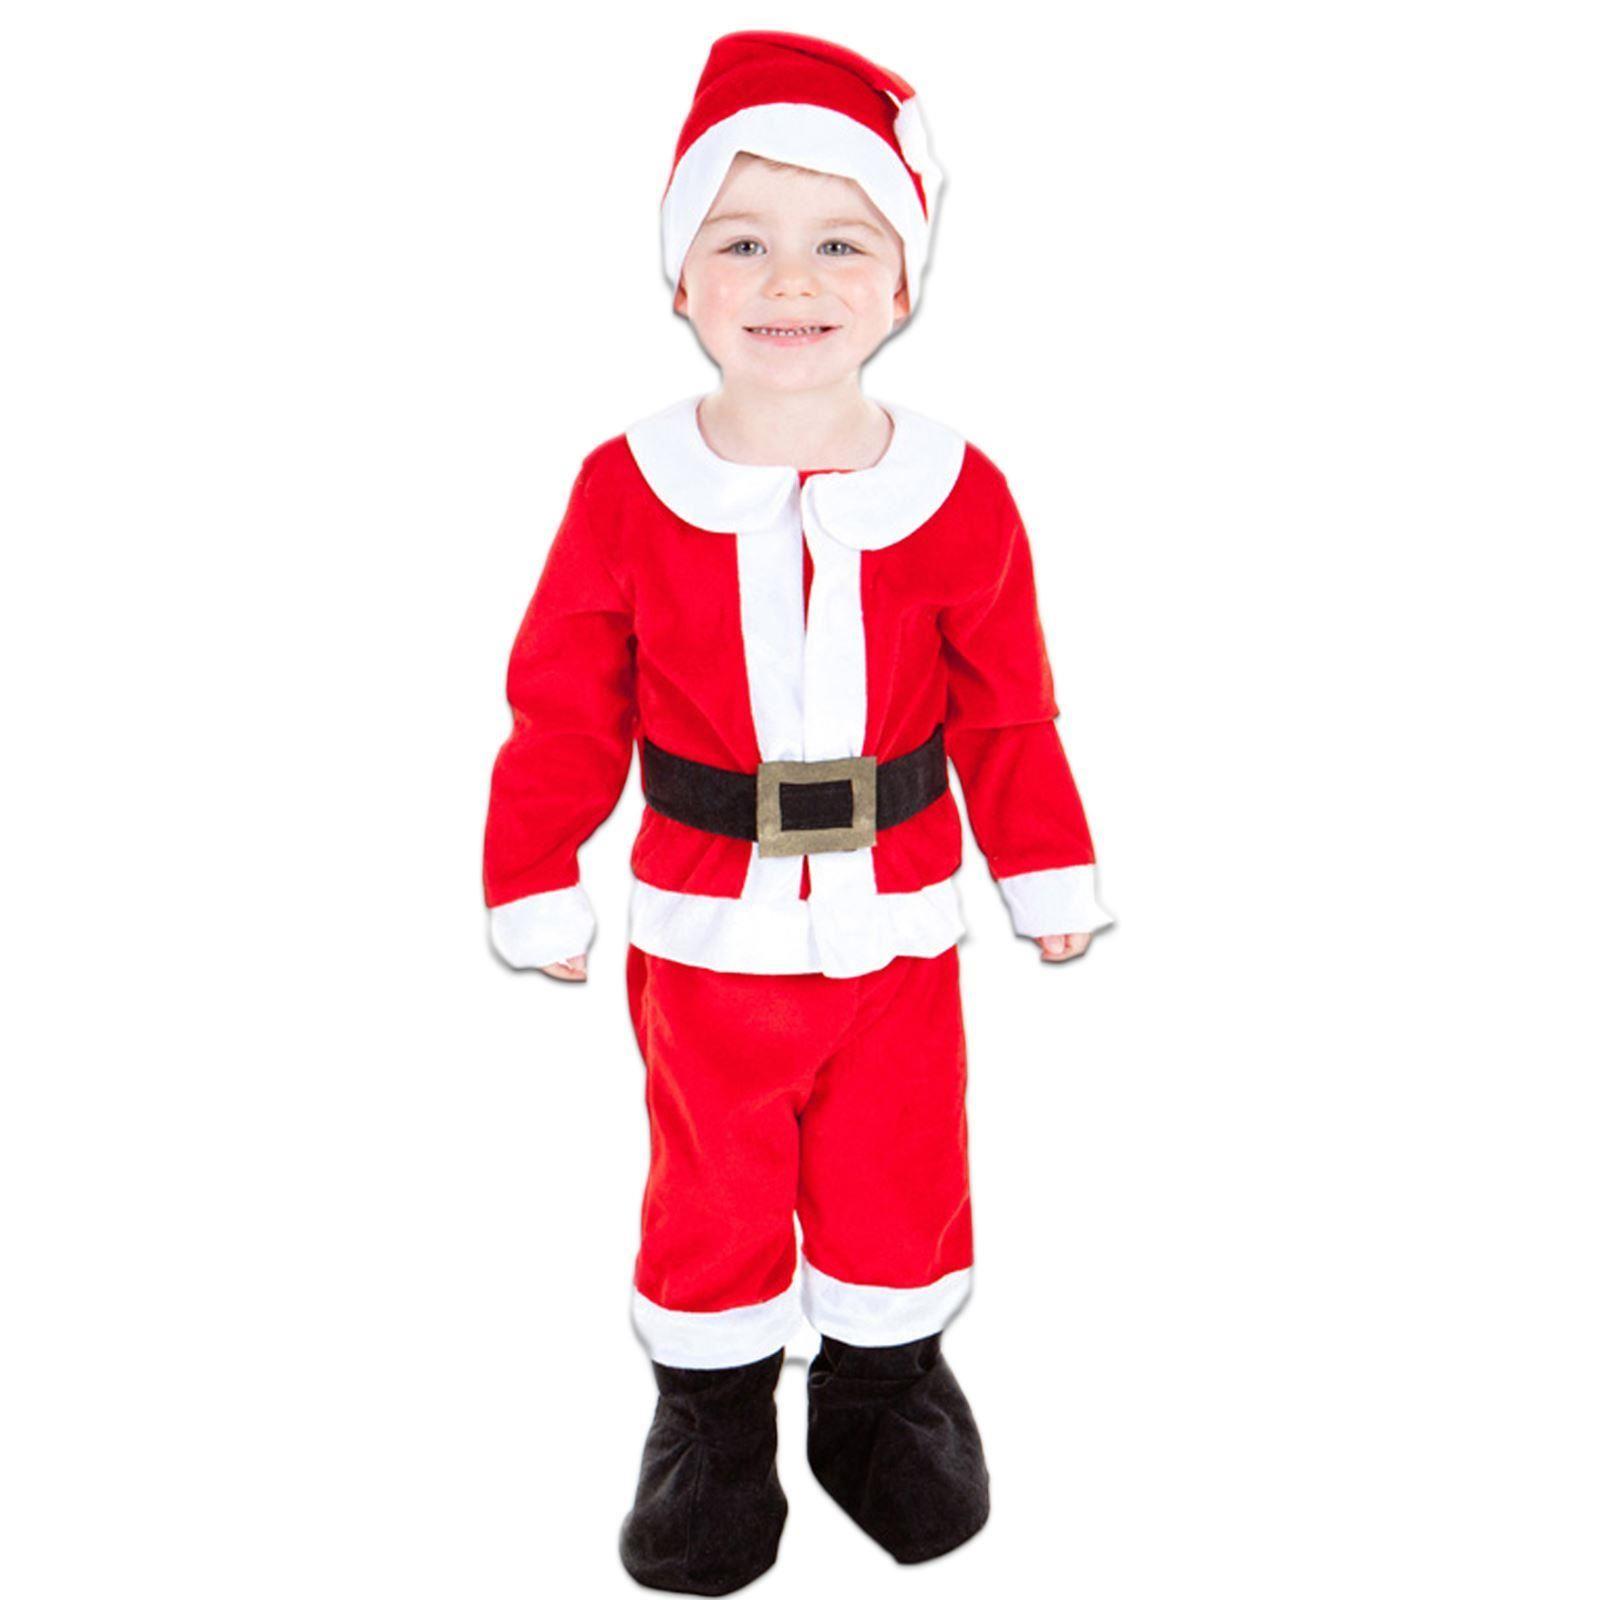 DELUXE BOYS GIRLS BABY TODDLER XMAS CHRISTMAS FESTIVE FANCY DRESS